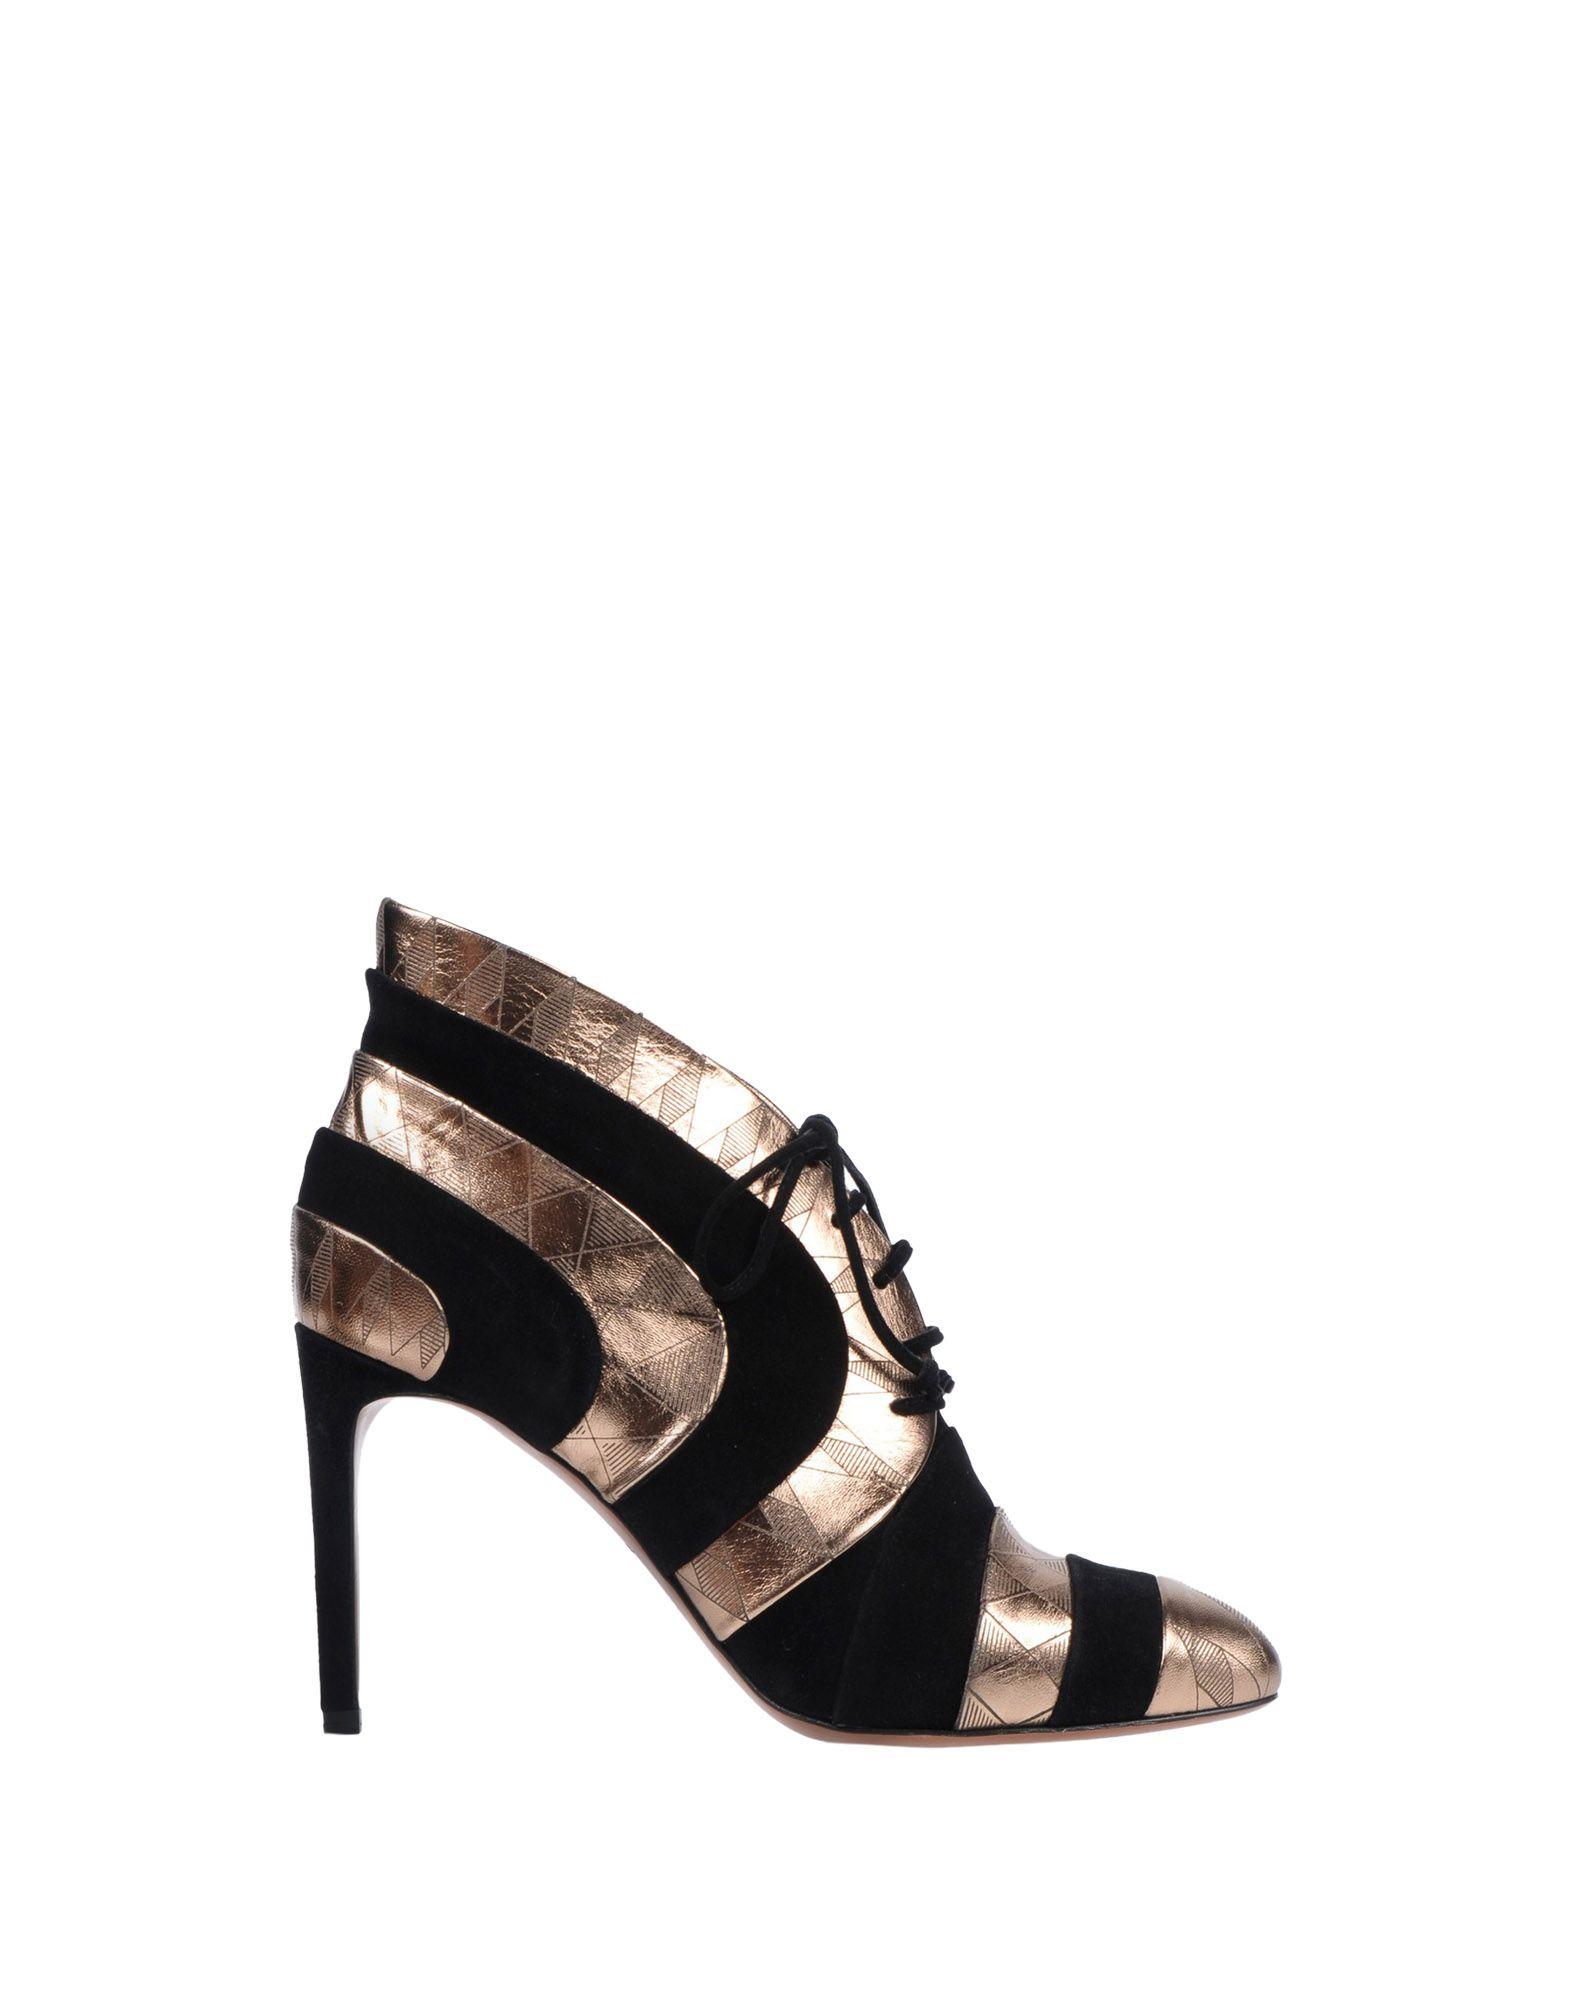 Alaïa Schnürschuhe Damen  11508877OJGünstige gut aussehende Schuhe